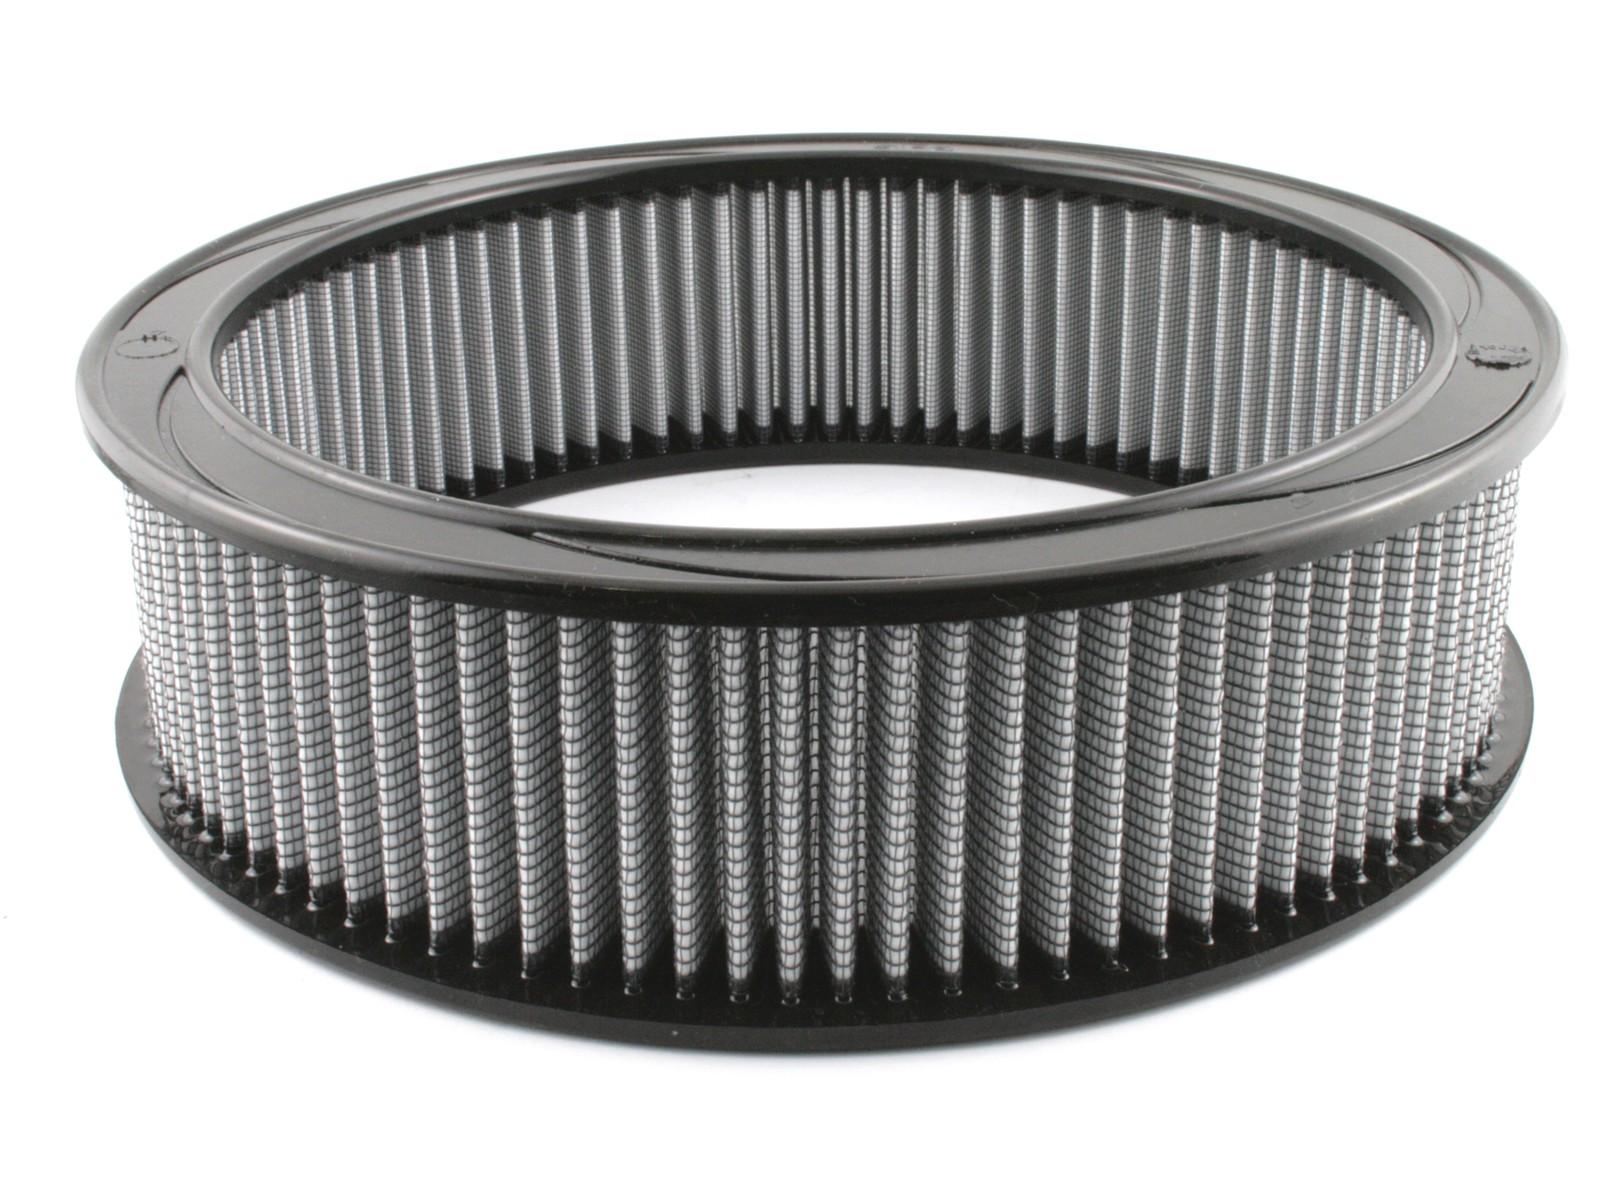 aFe POWER 11-10001 Magnum FLOW Pro DRY S Air Filter